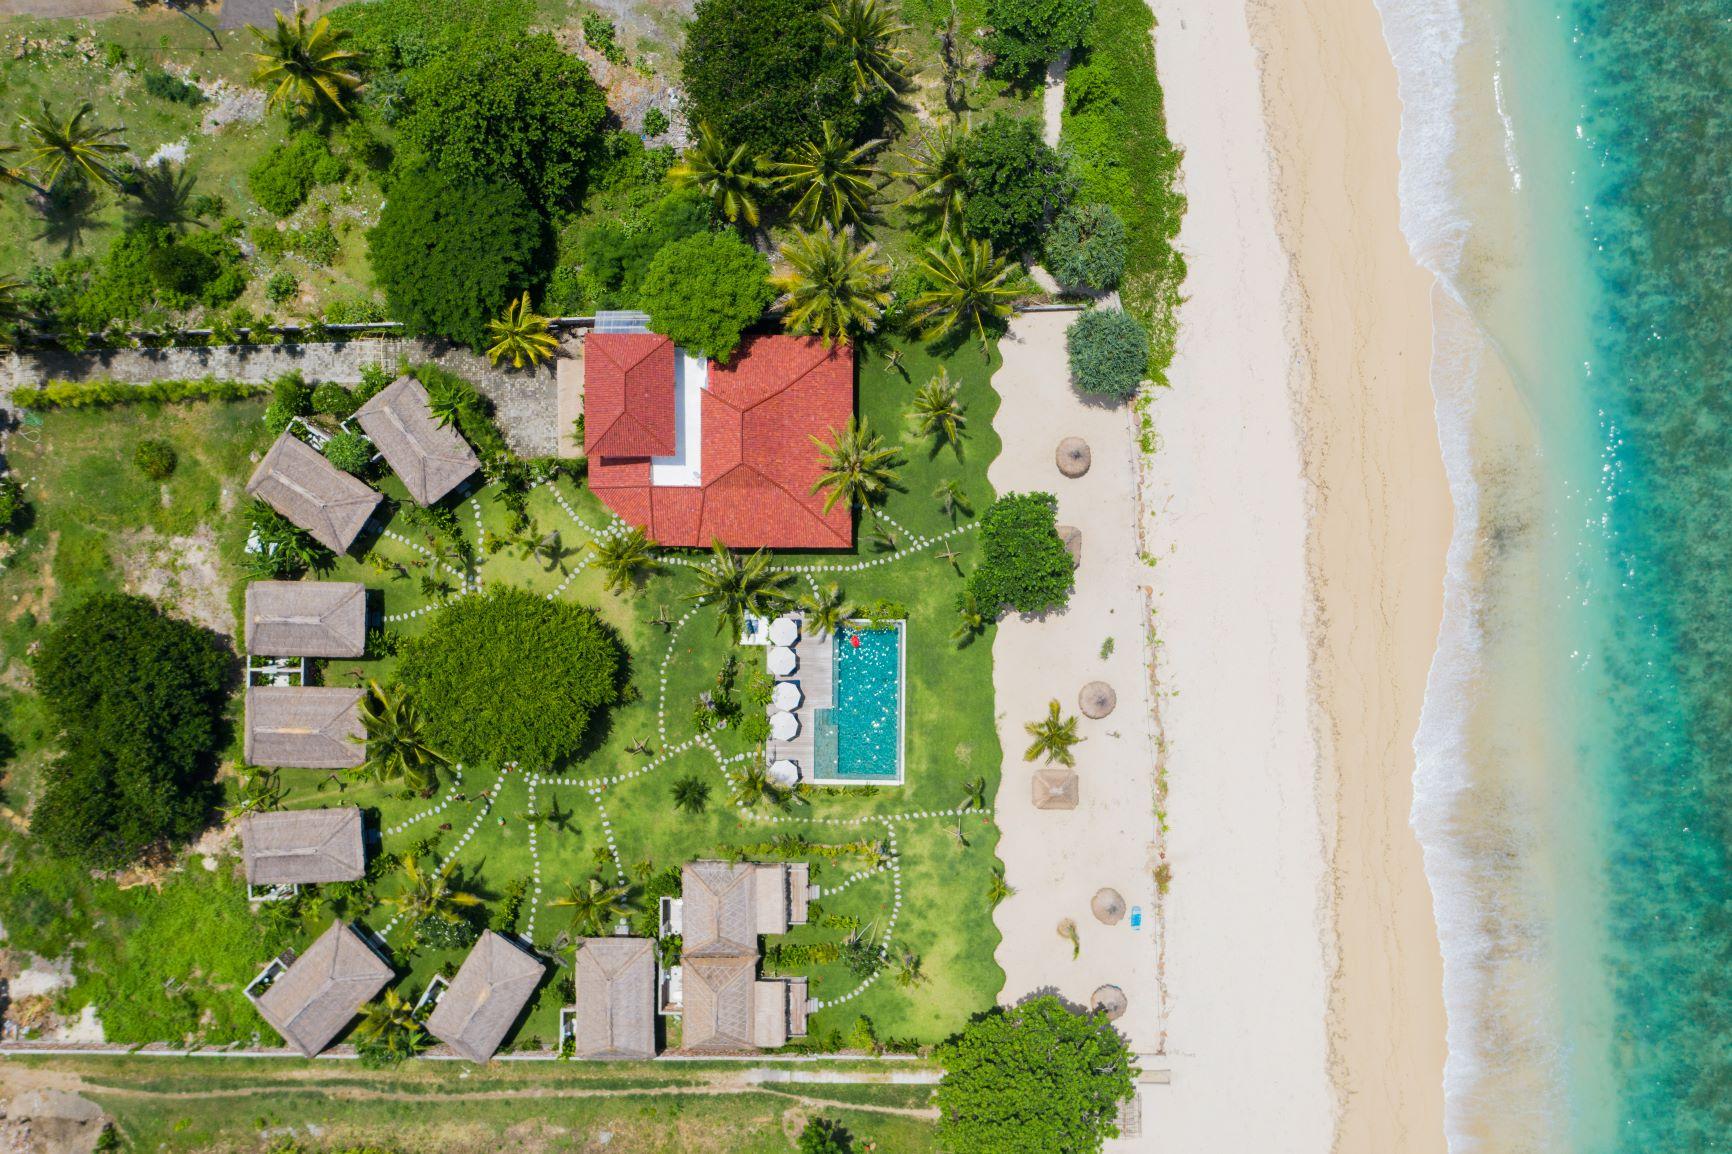 Nagaindo land for sale investment property Kuta Lombok surf yoga villa Twin Peaks Selong Belanak Serangan